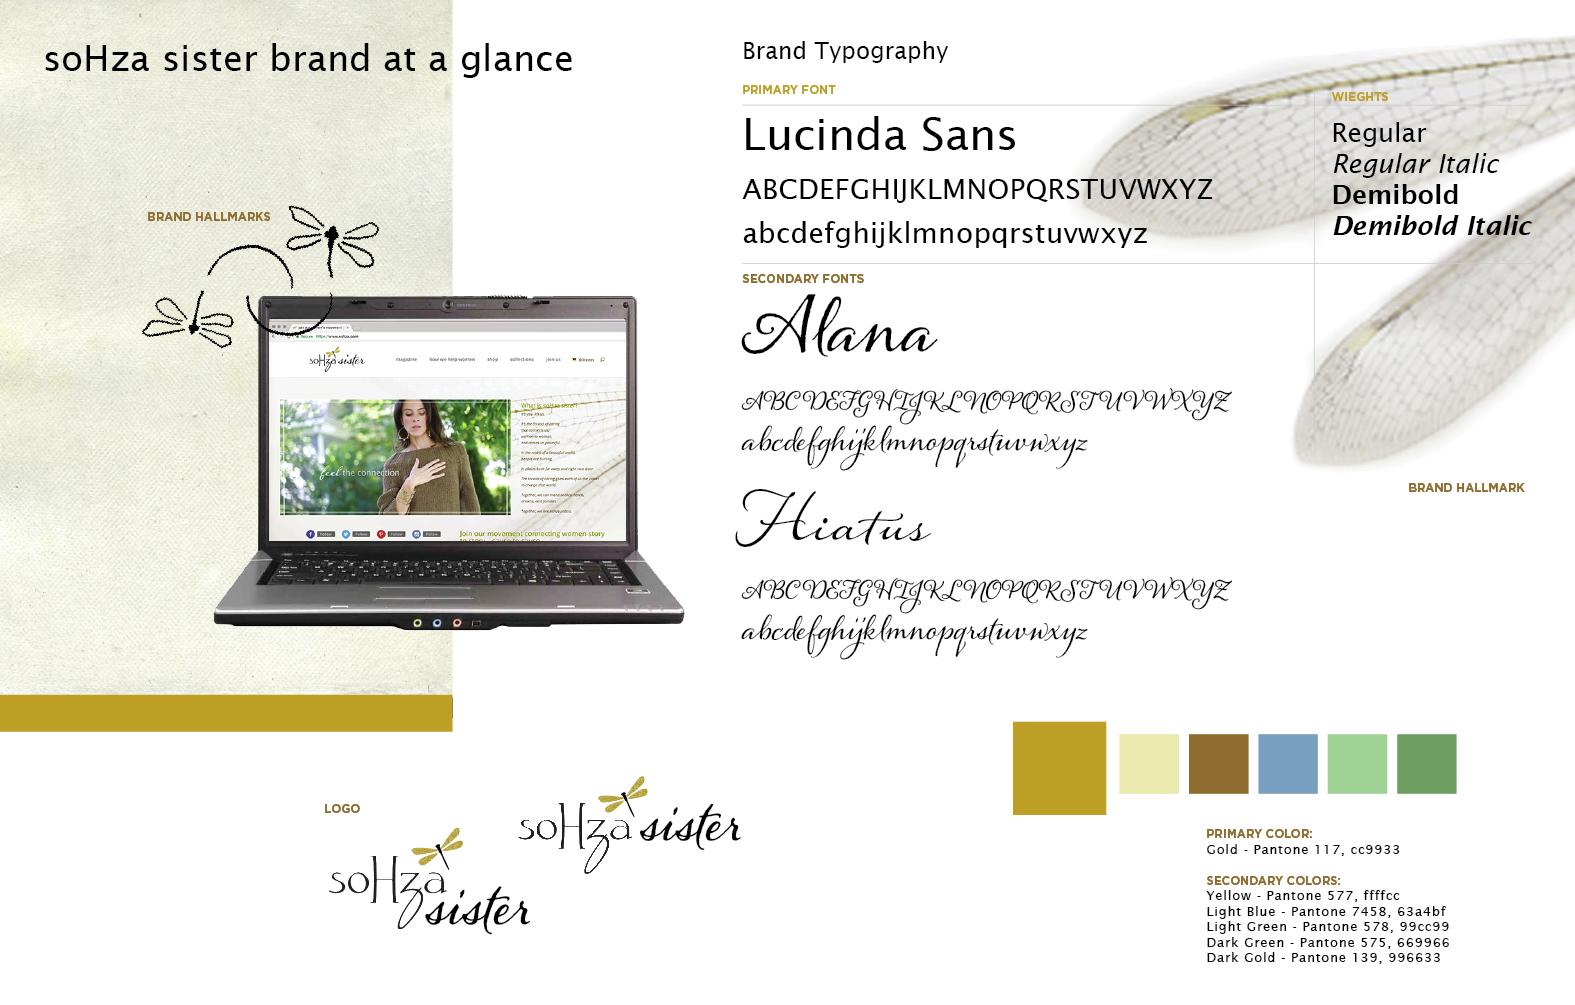 soHza sister brand at a glance.png